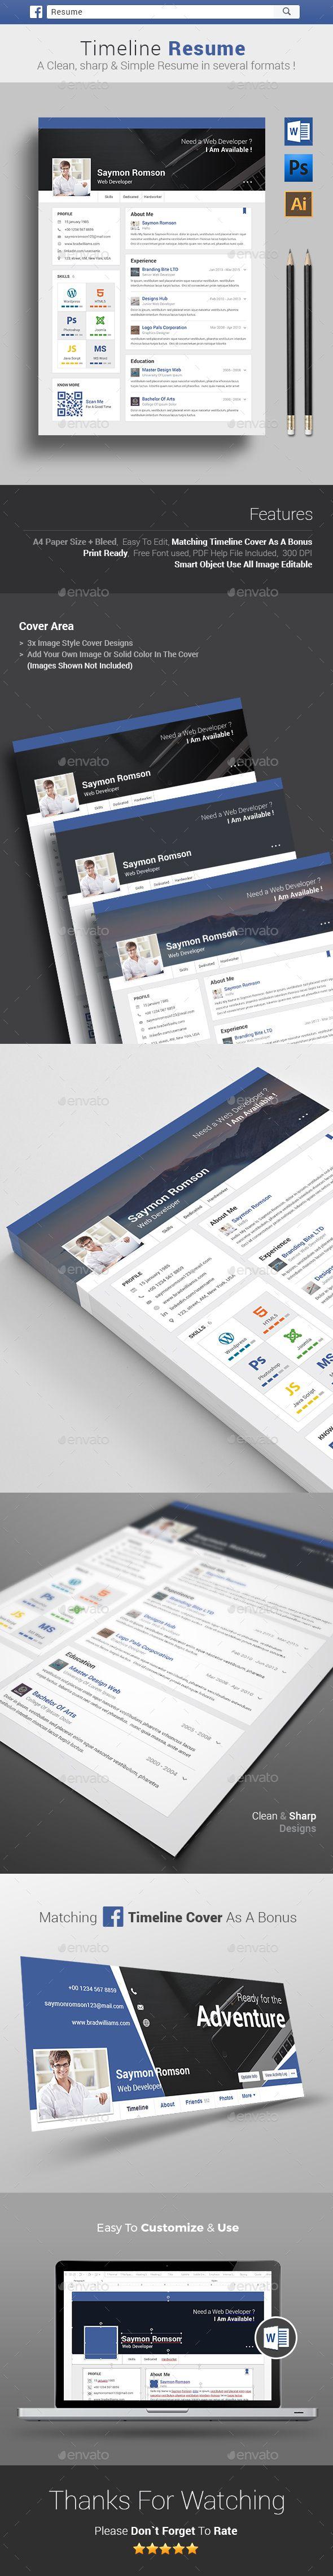 Resume | Bewerbung